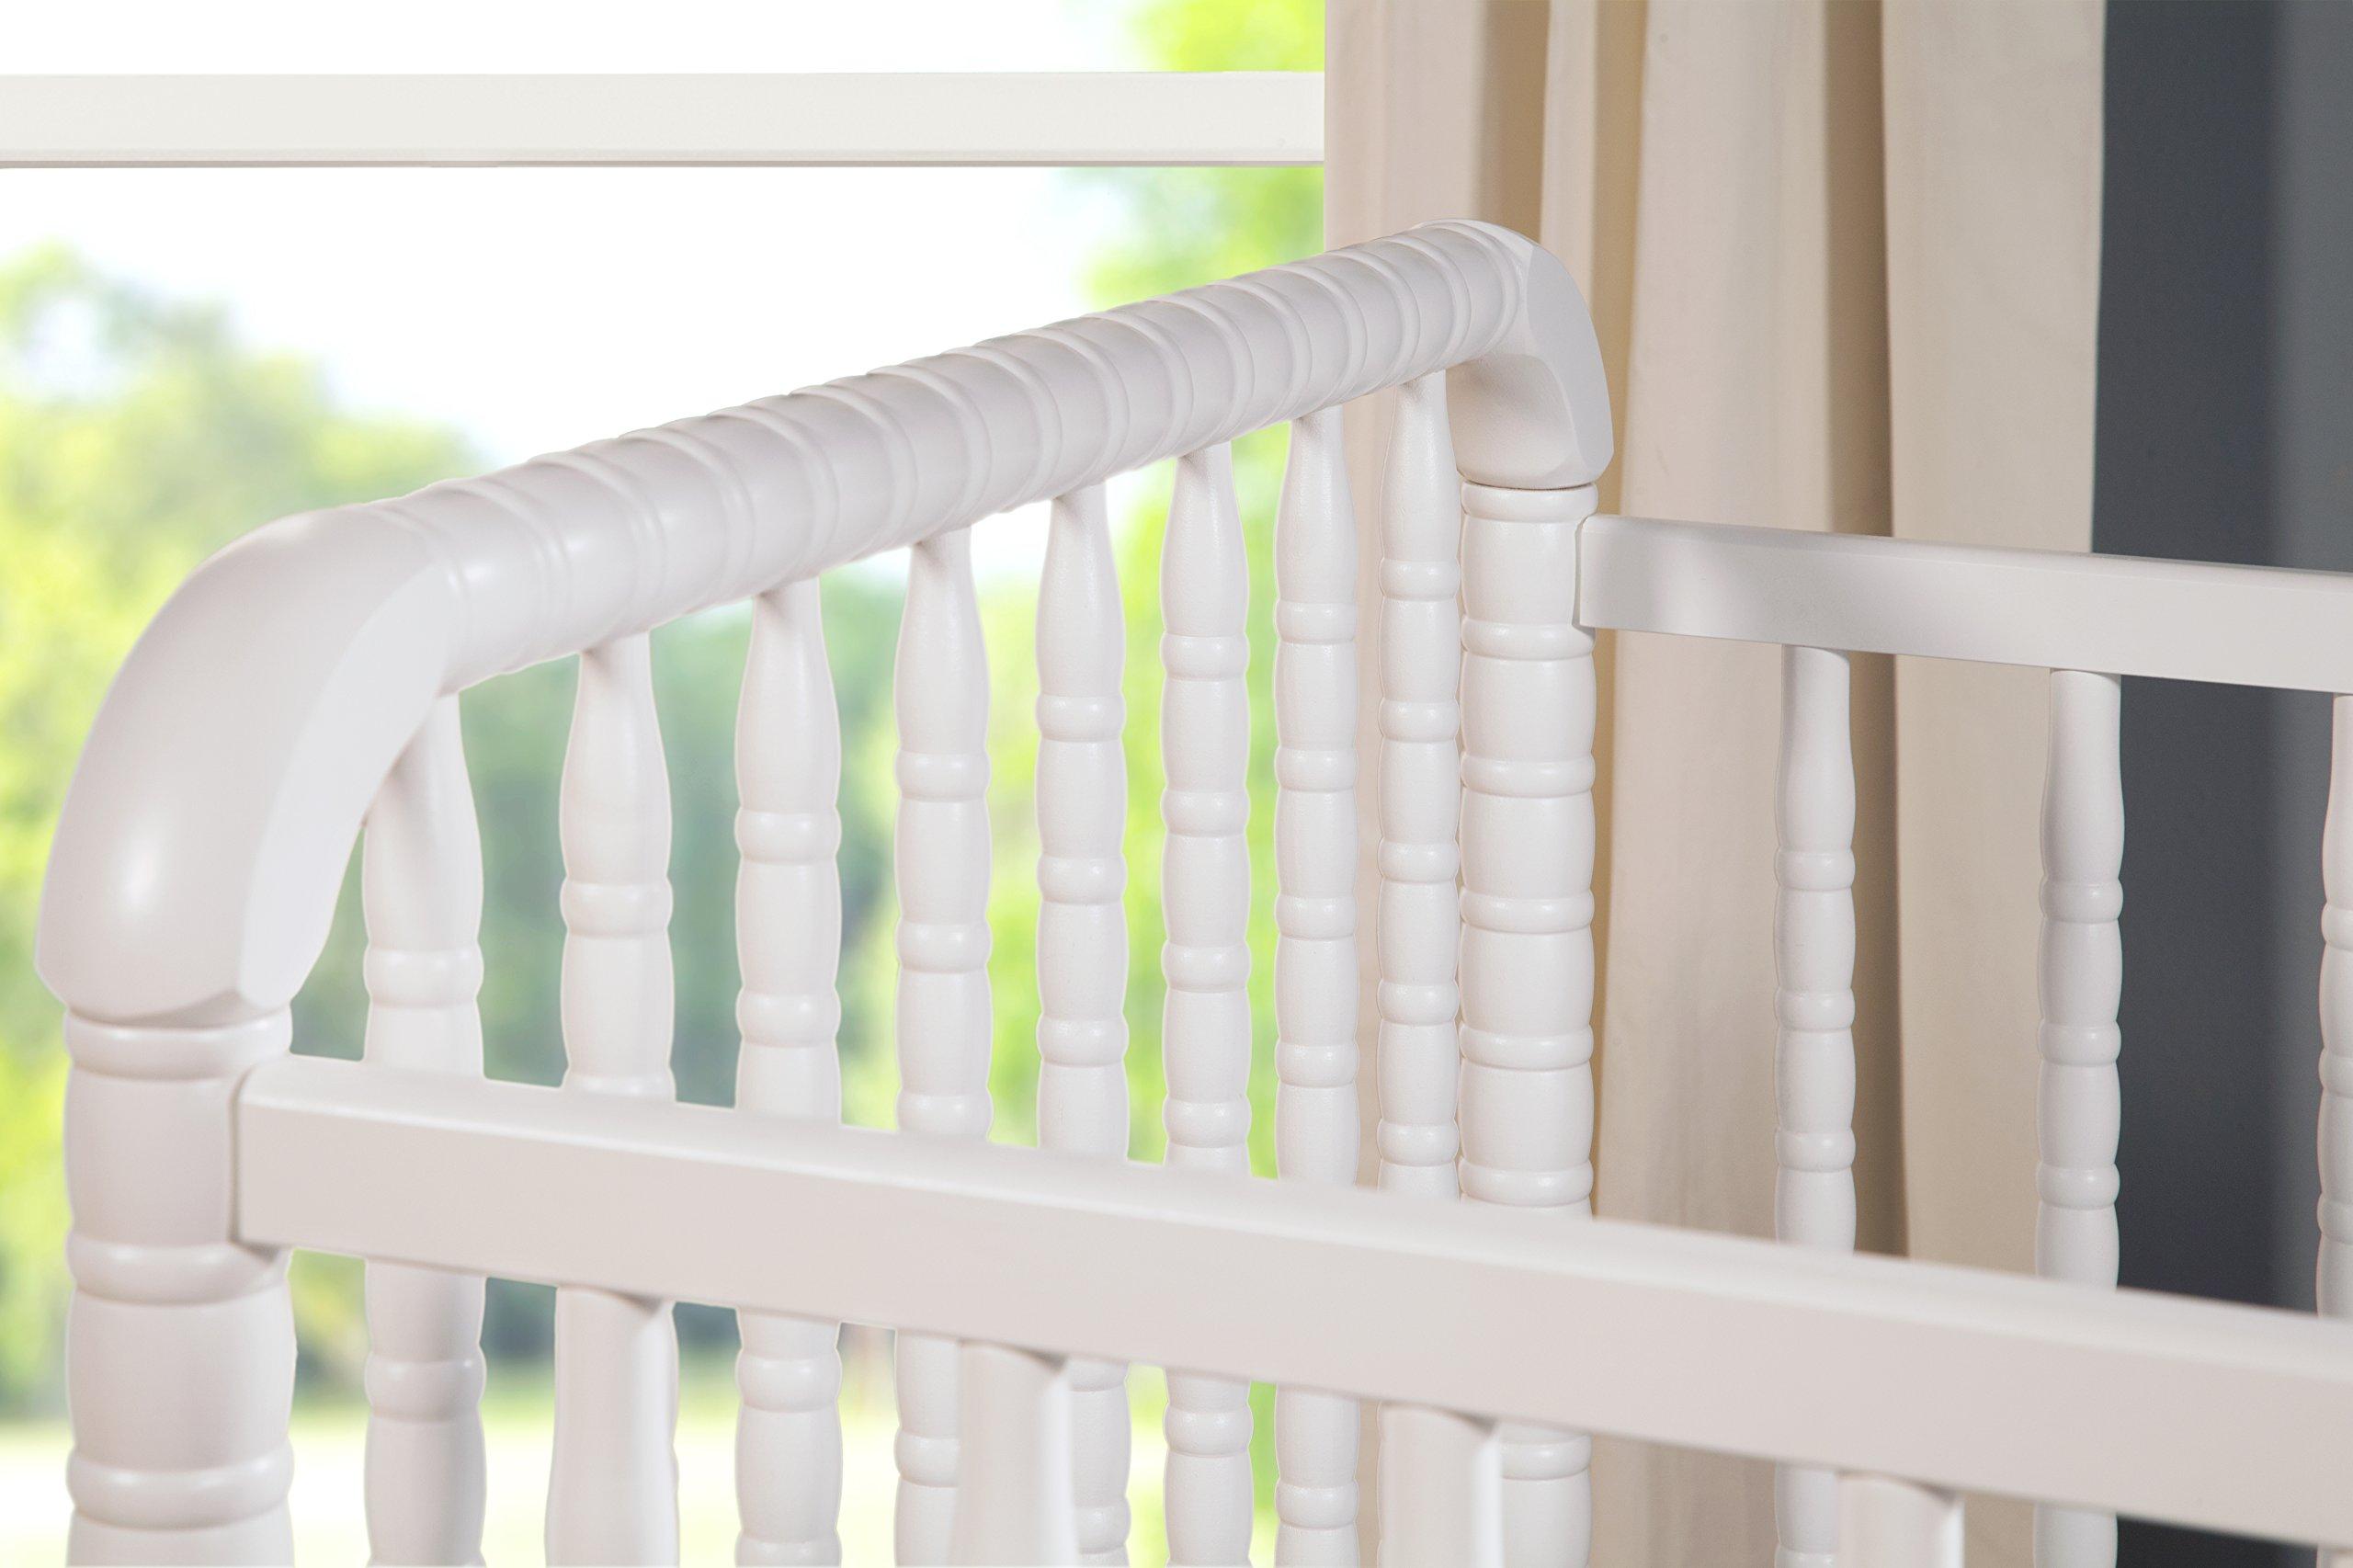 DaVinci Jenny Lind Stationary Crib, White by DaVinci (Image #5)